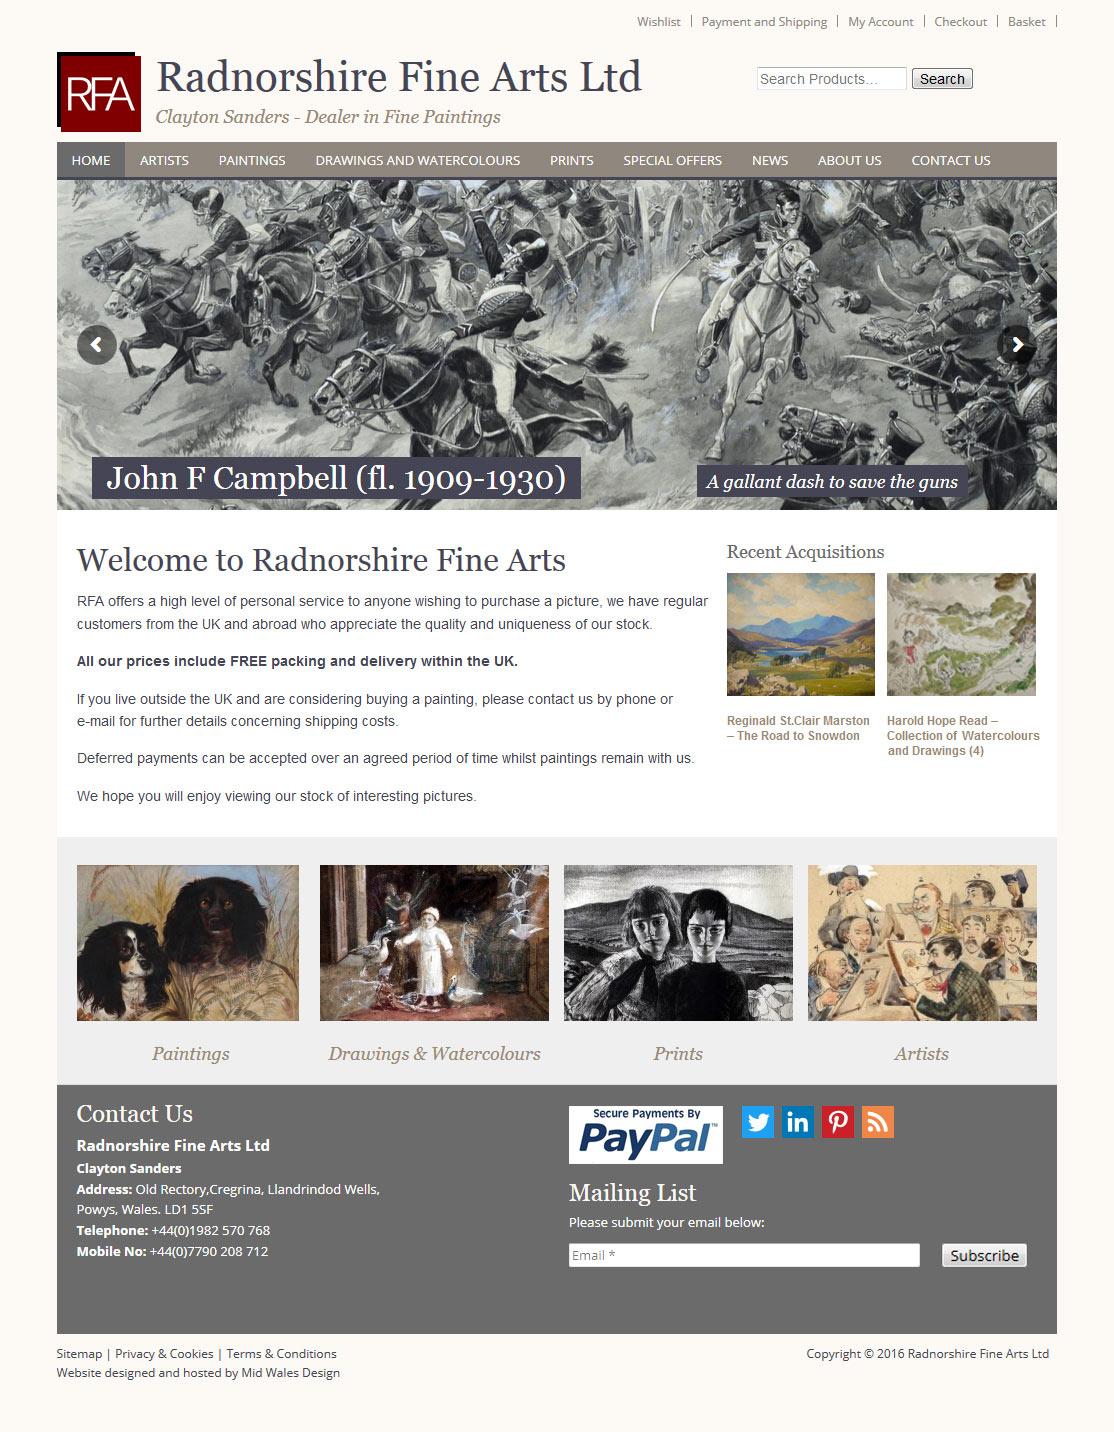 Radnorshire Fine Arts eCommerce website